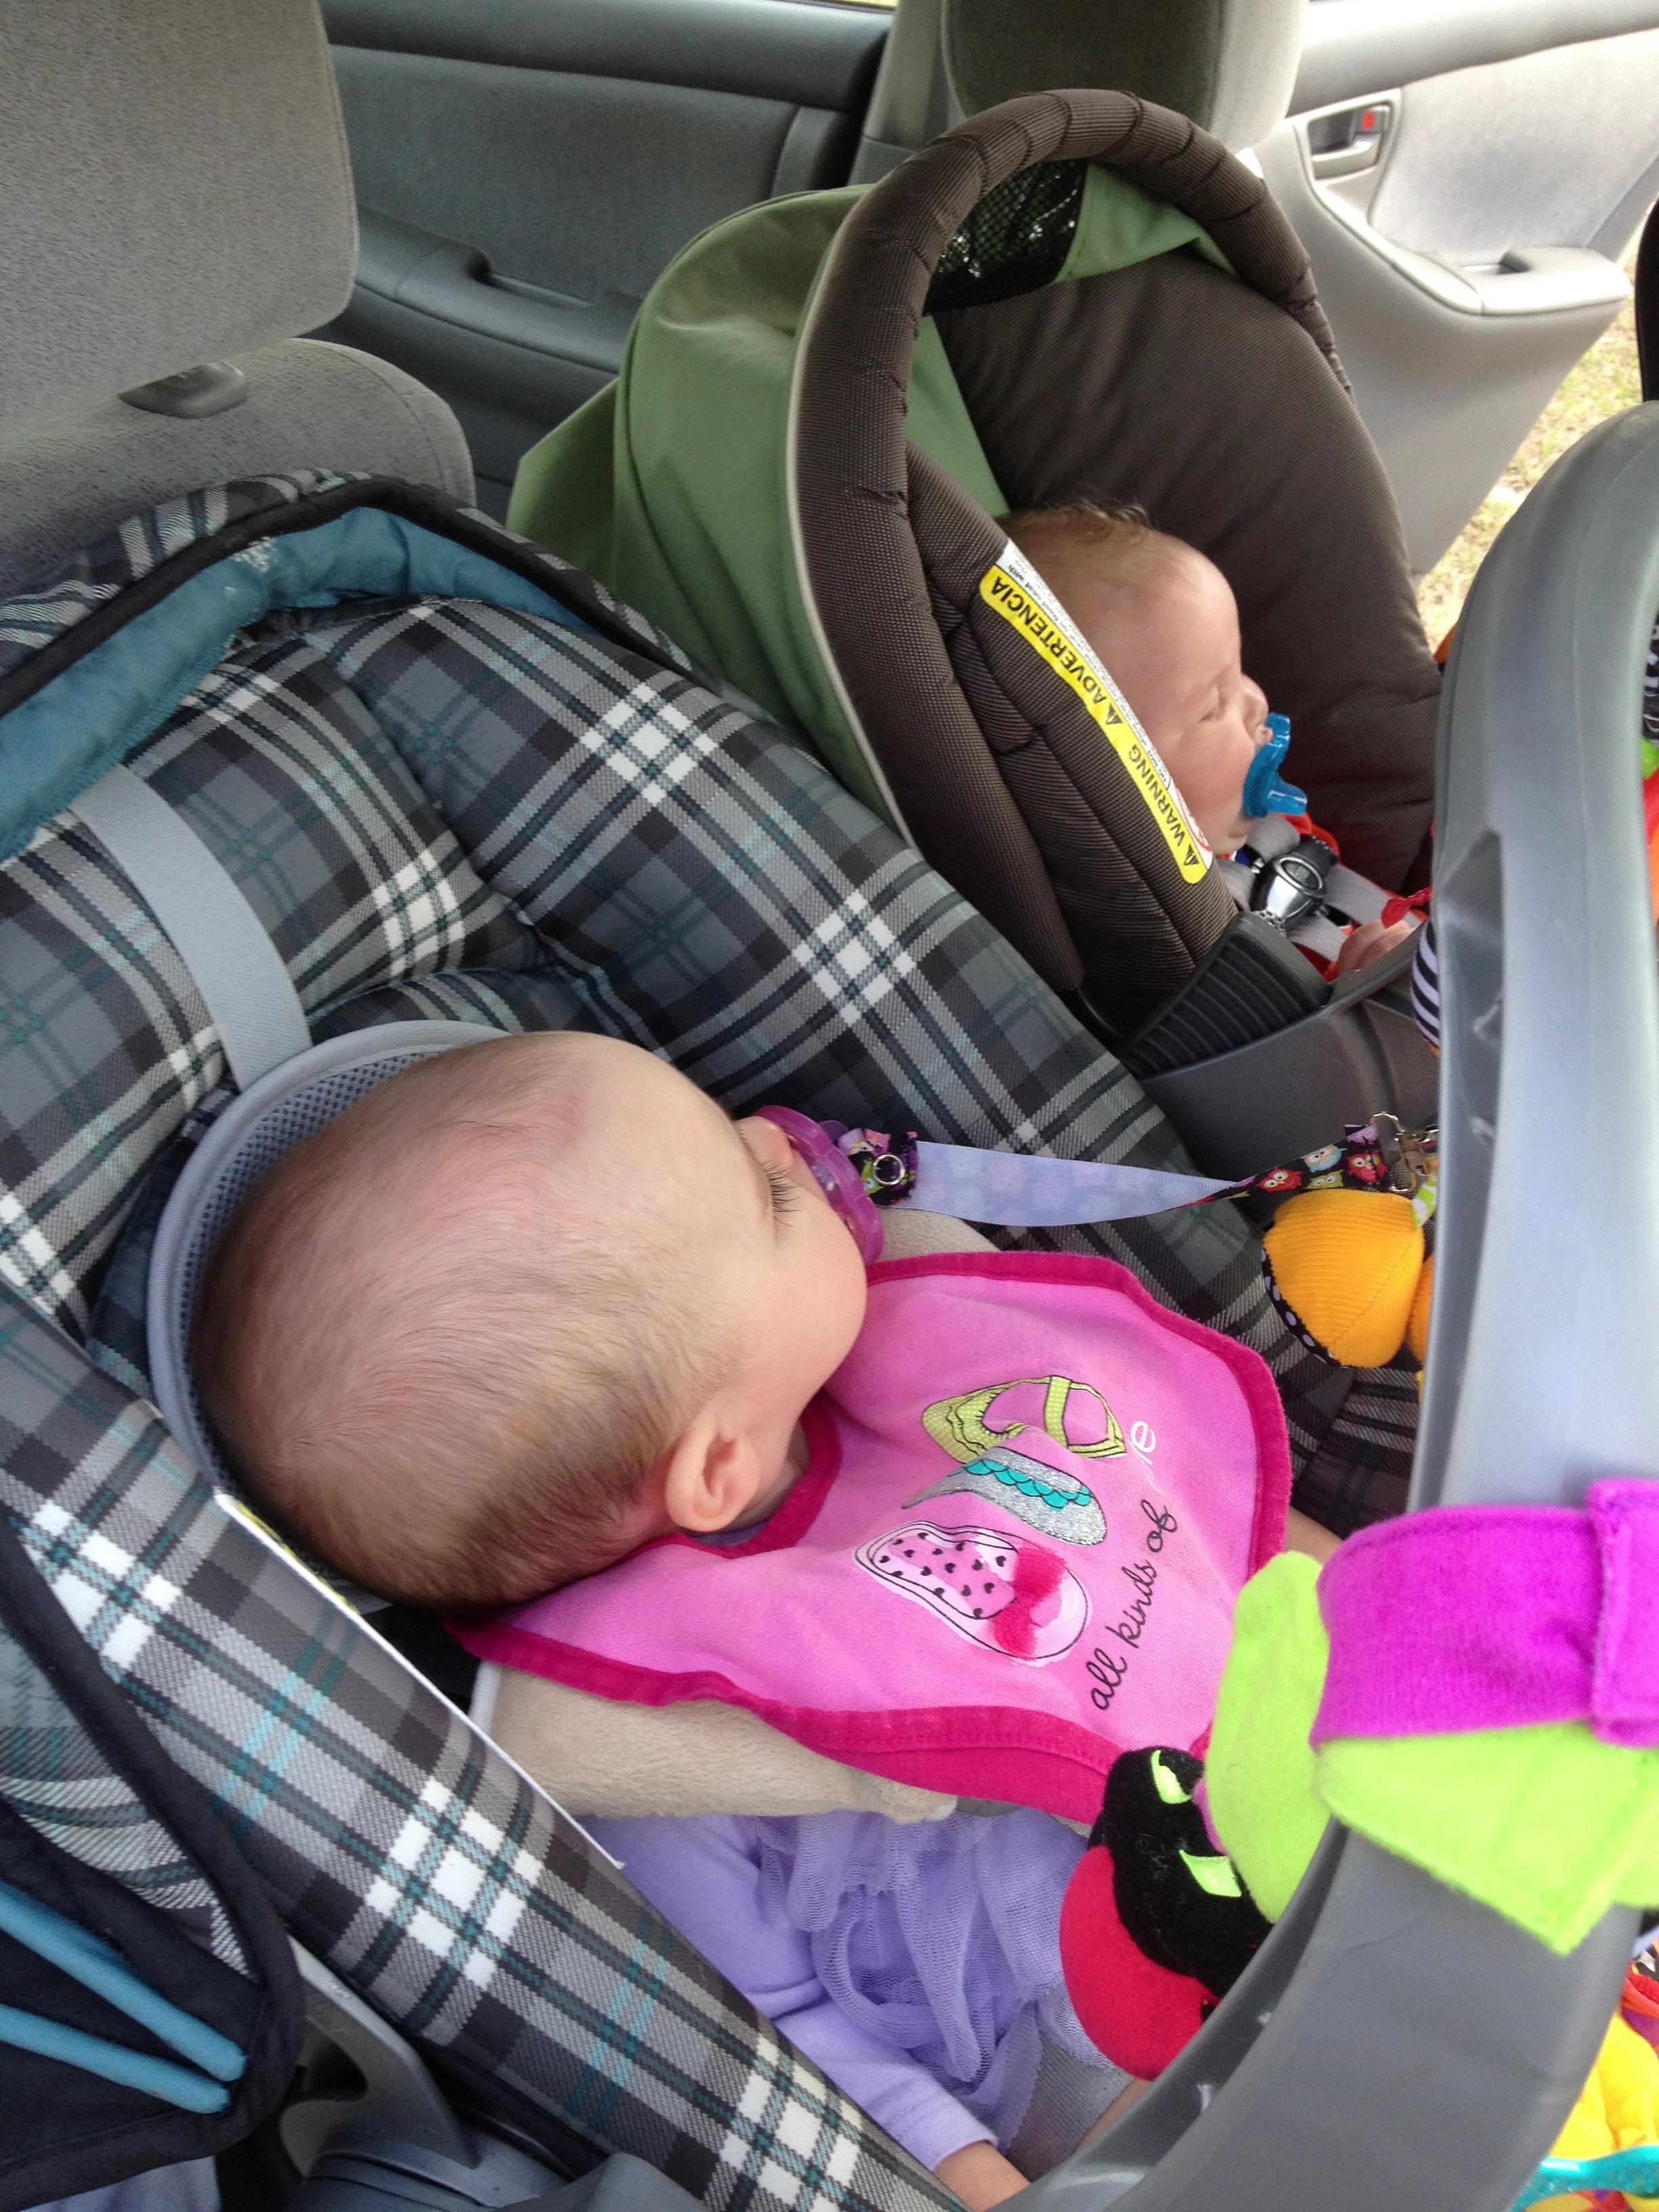 backseat full o' babies